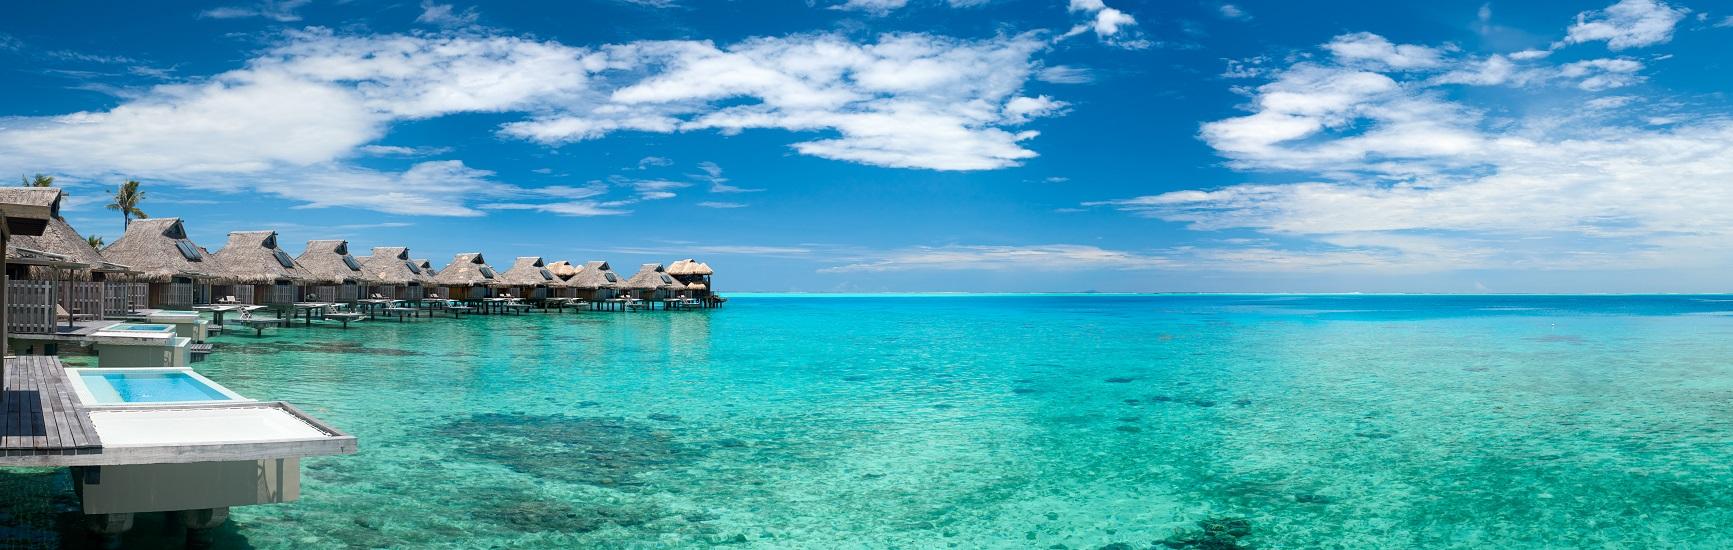 https://tahititourisme.com/wp-content/uploads/2017/09/HERBERGEMENT-Conrad-Bora-Bora-Nui-3.jpg